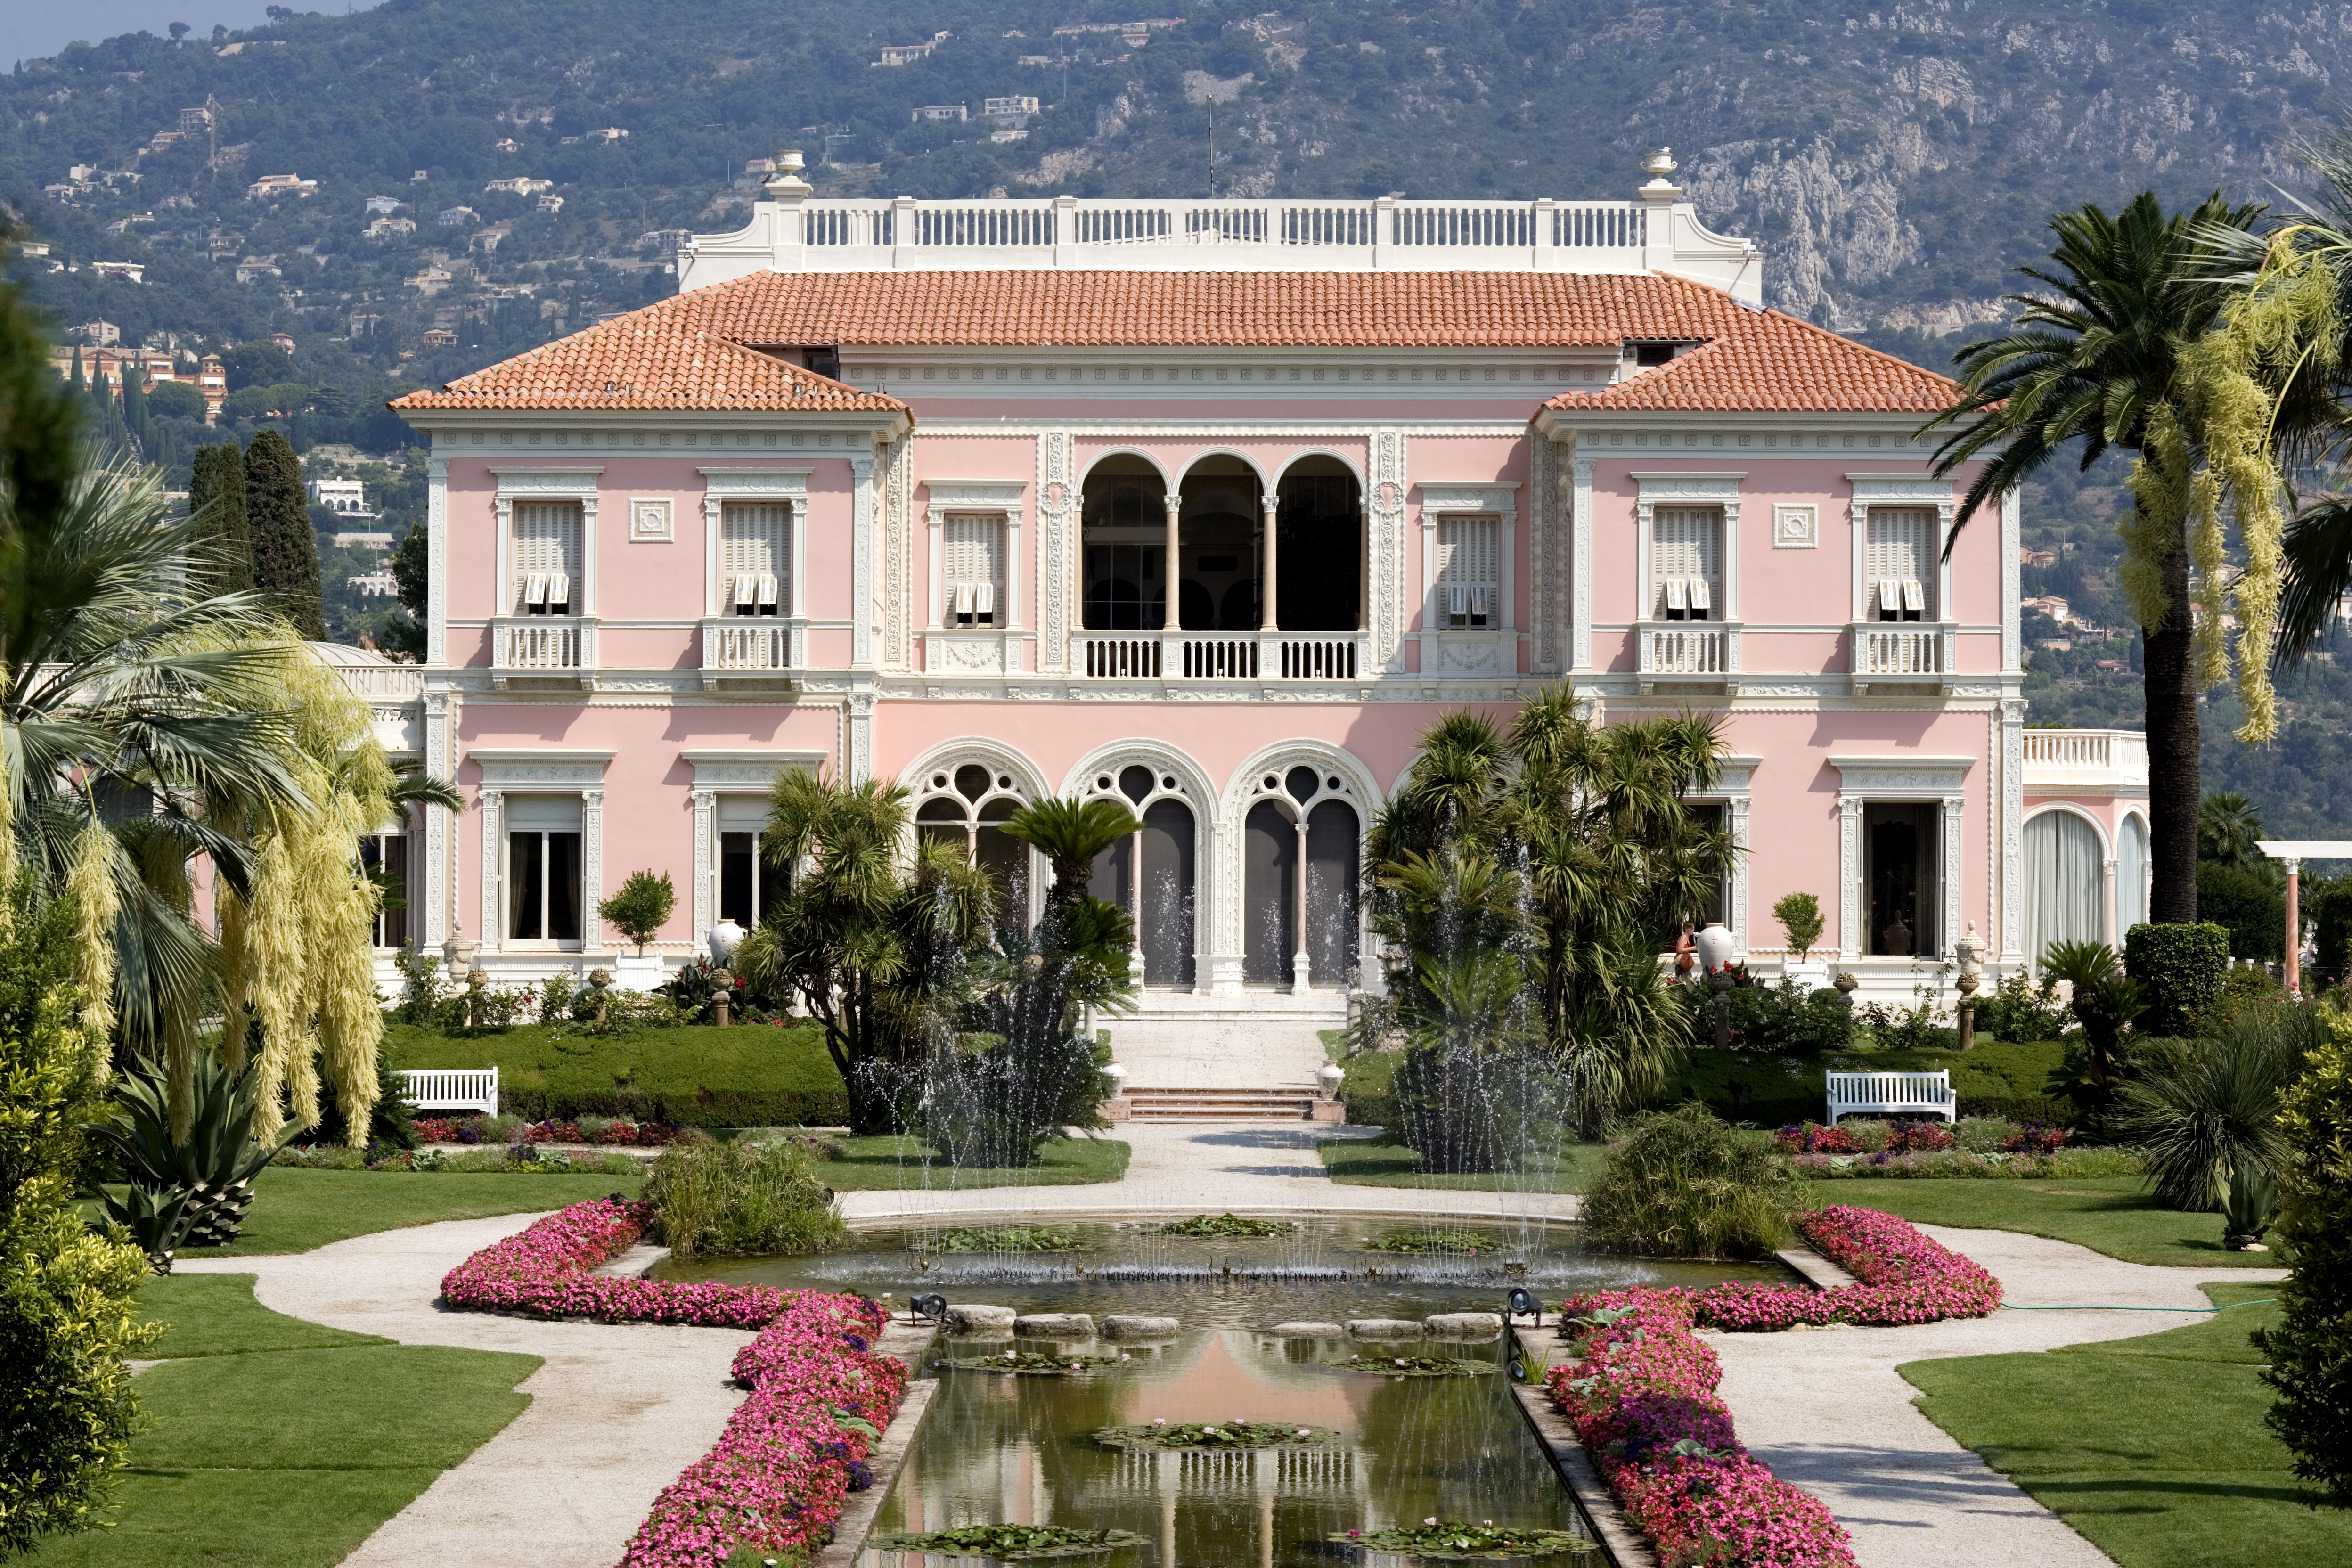 la villa latin dating site The show is set near sant llorenc des cardassar on majorca, but its specific  address has been kept secret.